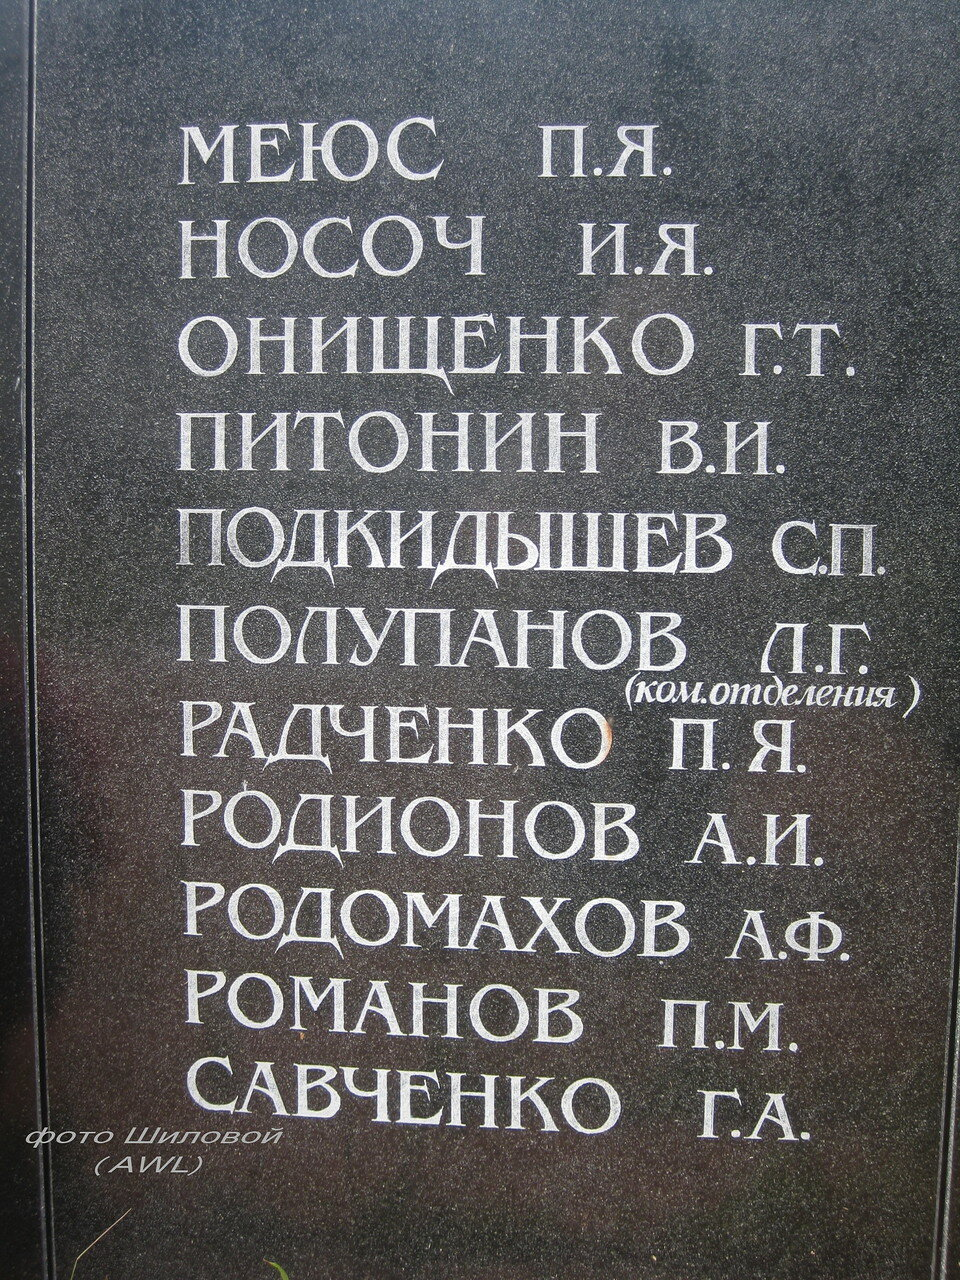 https://img-fotki.yandex.ru/get/44085/199368979.1c/0_1bdf4e_7df37d74_XXXL.jpg